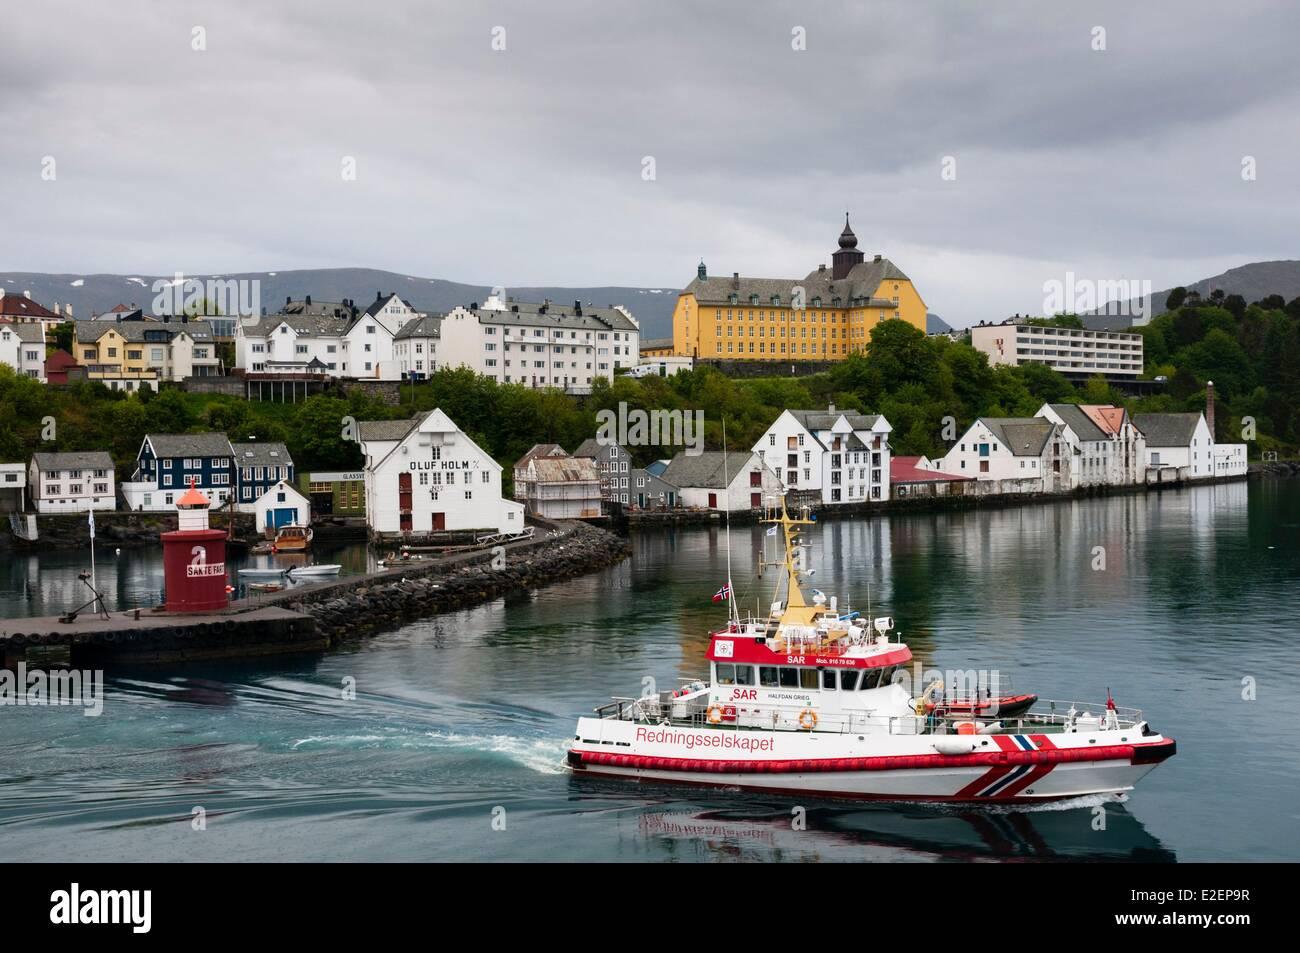 Norway, More og Romsdal County, Alesund - Stock Image